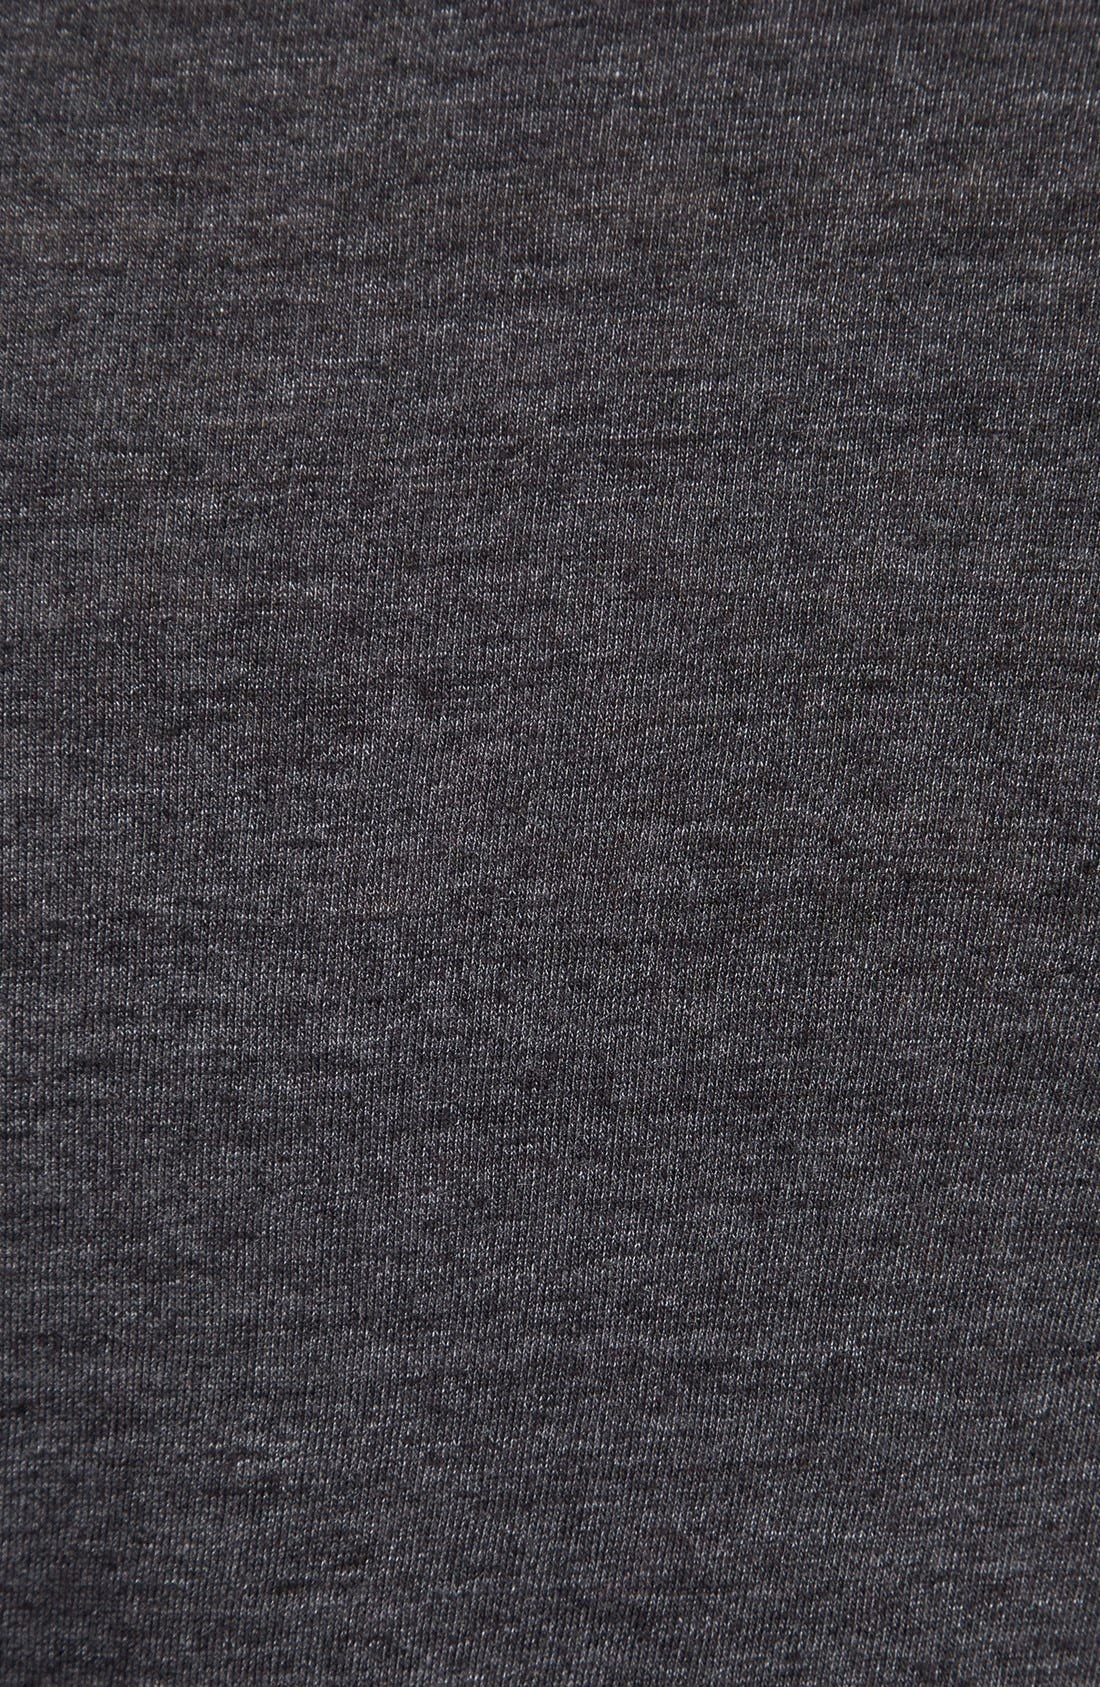 Alternate Image 3  - Junk Food 'Touchdown - Oakland Raiders' T-Shirt